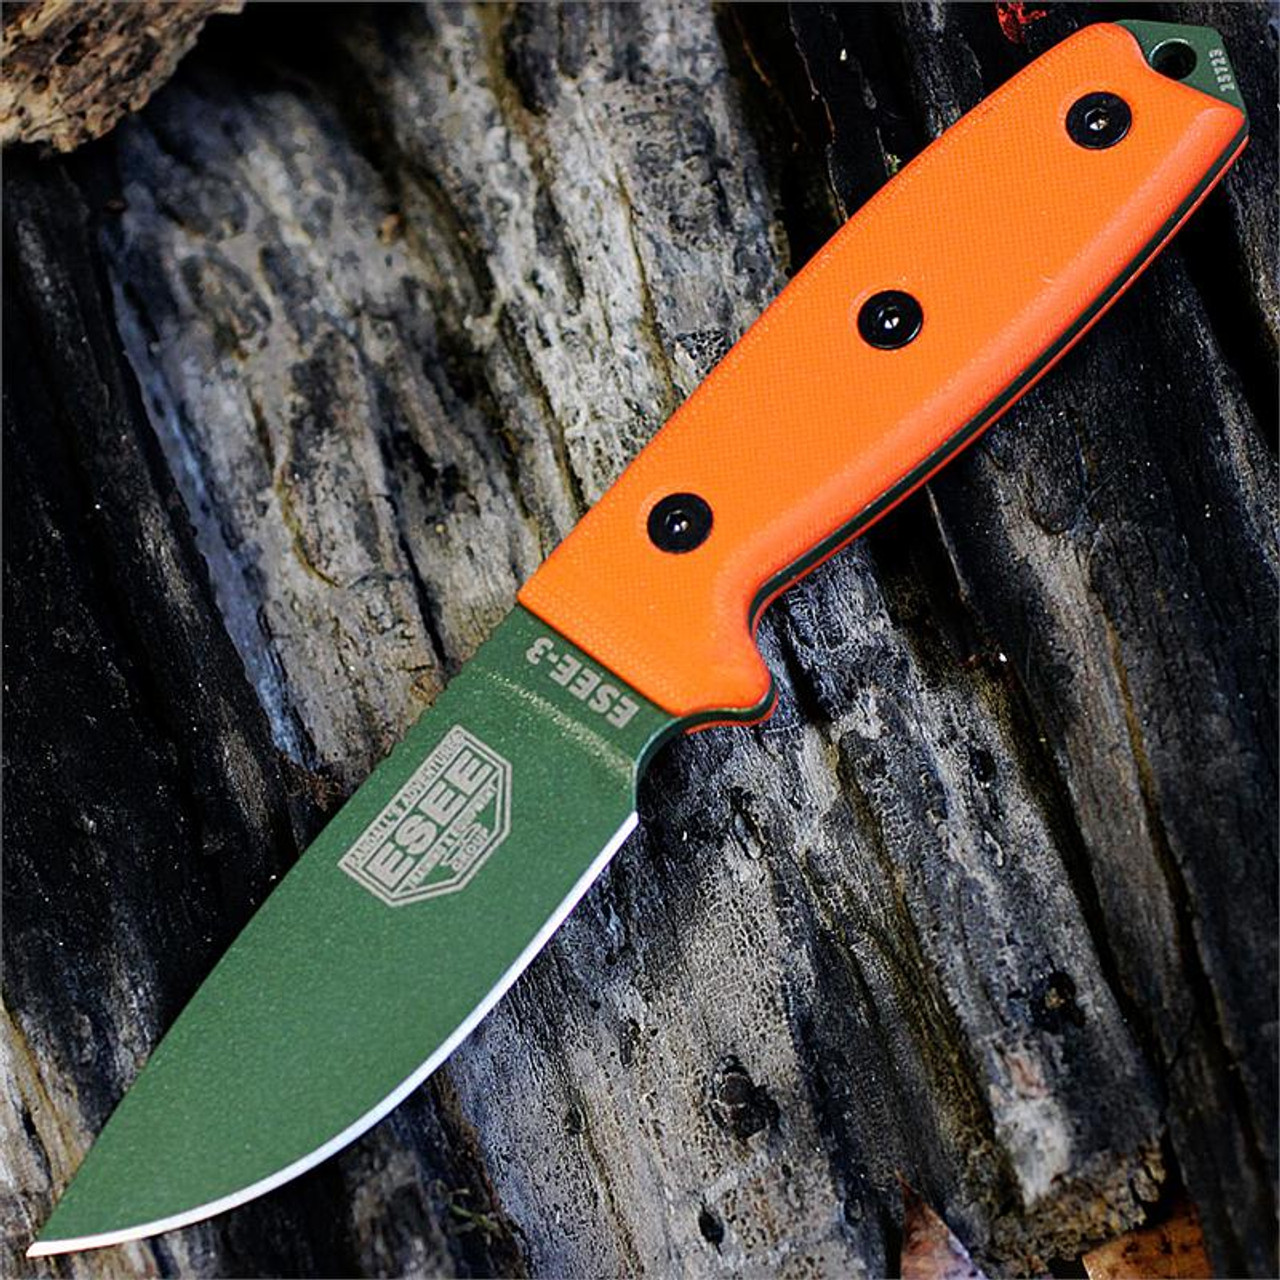 ESEE 3P-MB-OD, Plain Edge,Orange G-10 Handles, Black Sheath with Molle Back